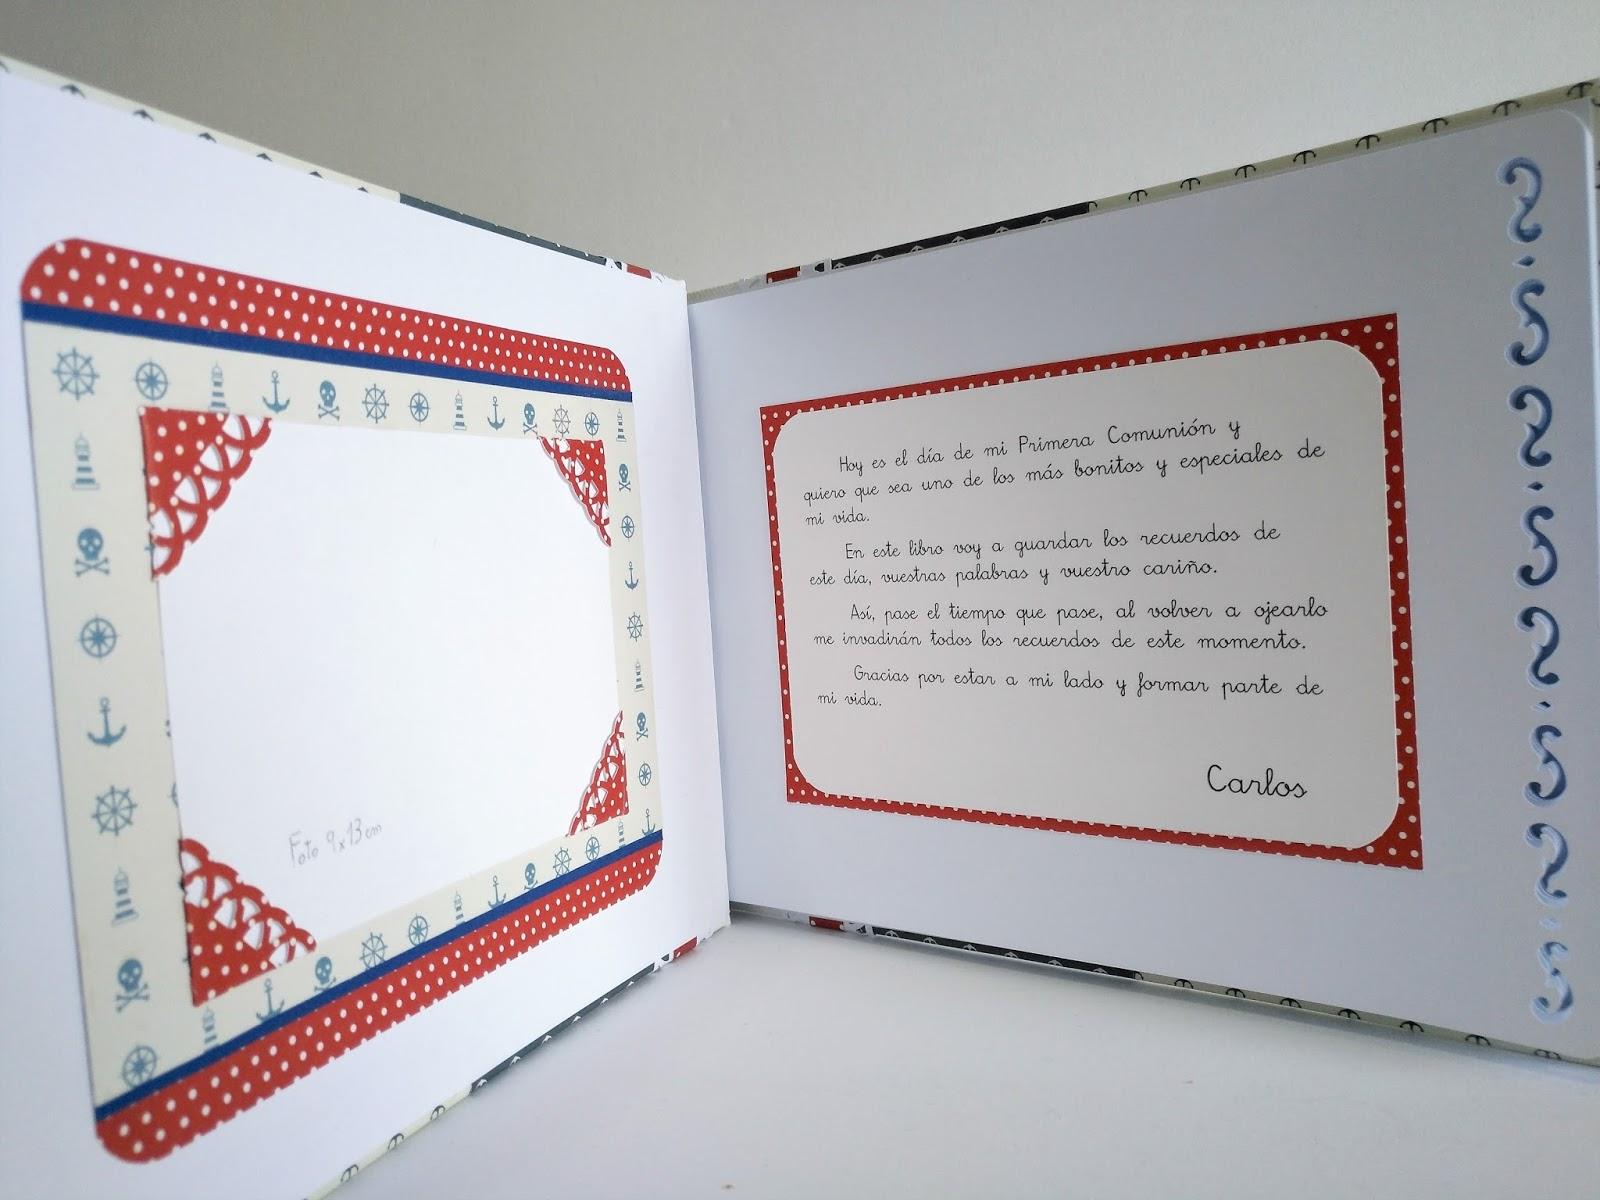 Libro de firmas de comunion con maletin marinero futbolero for Interior libro de firmas comunion